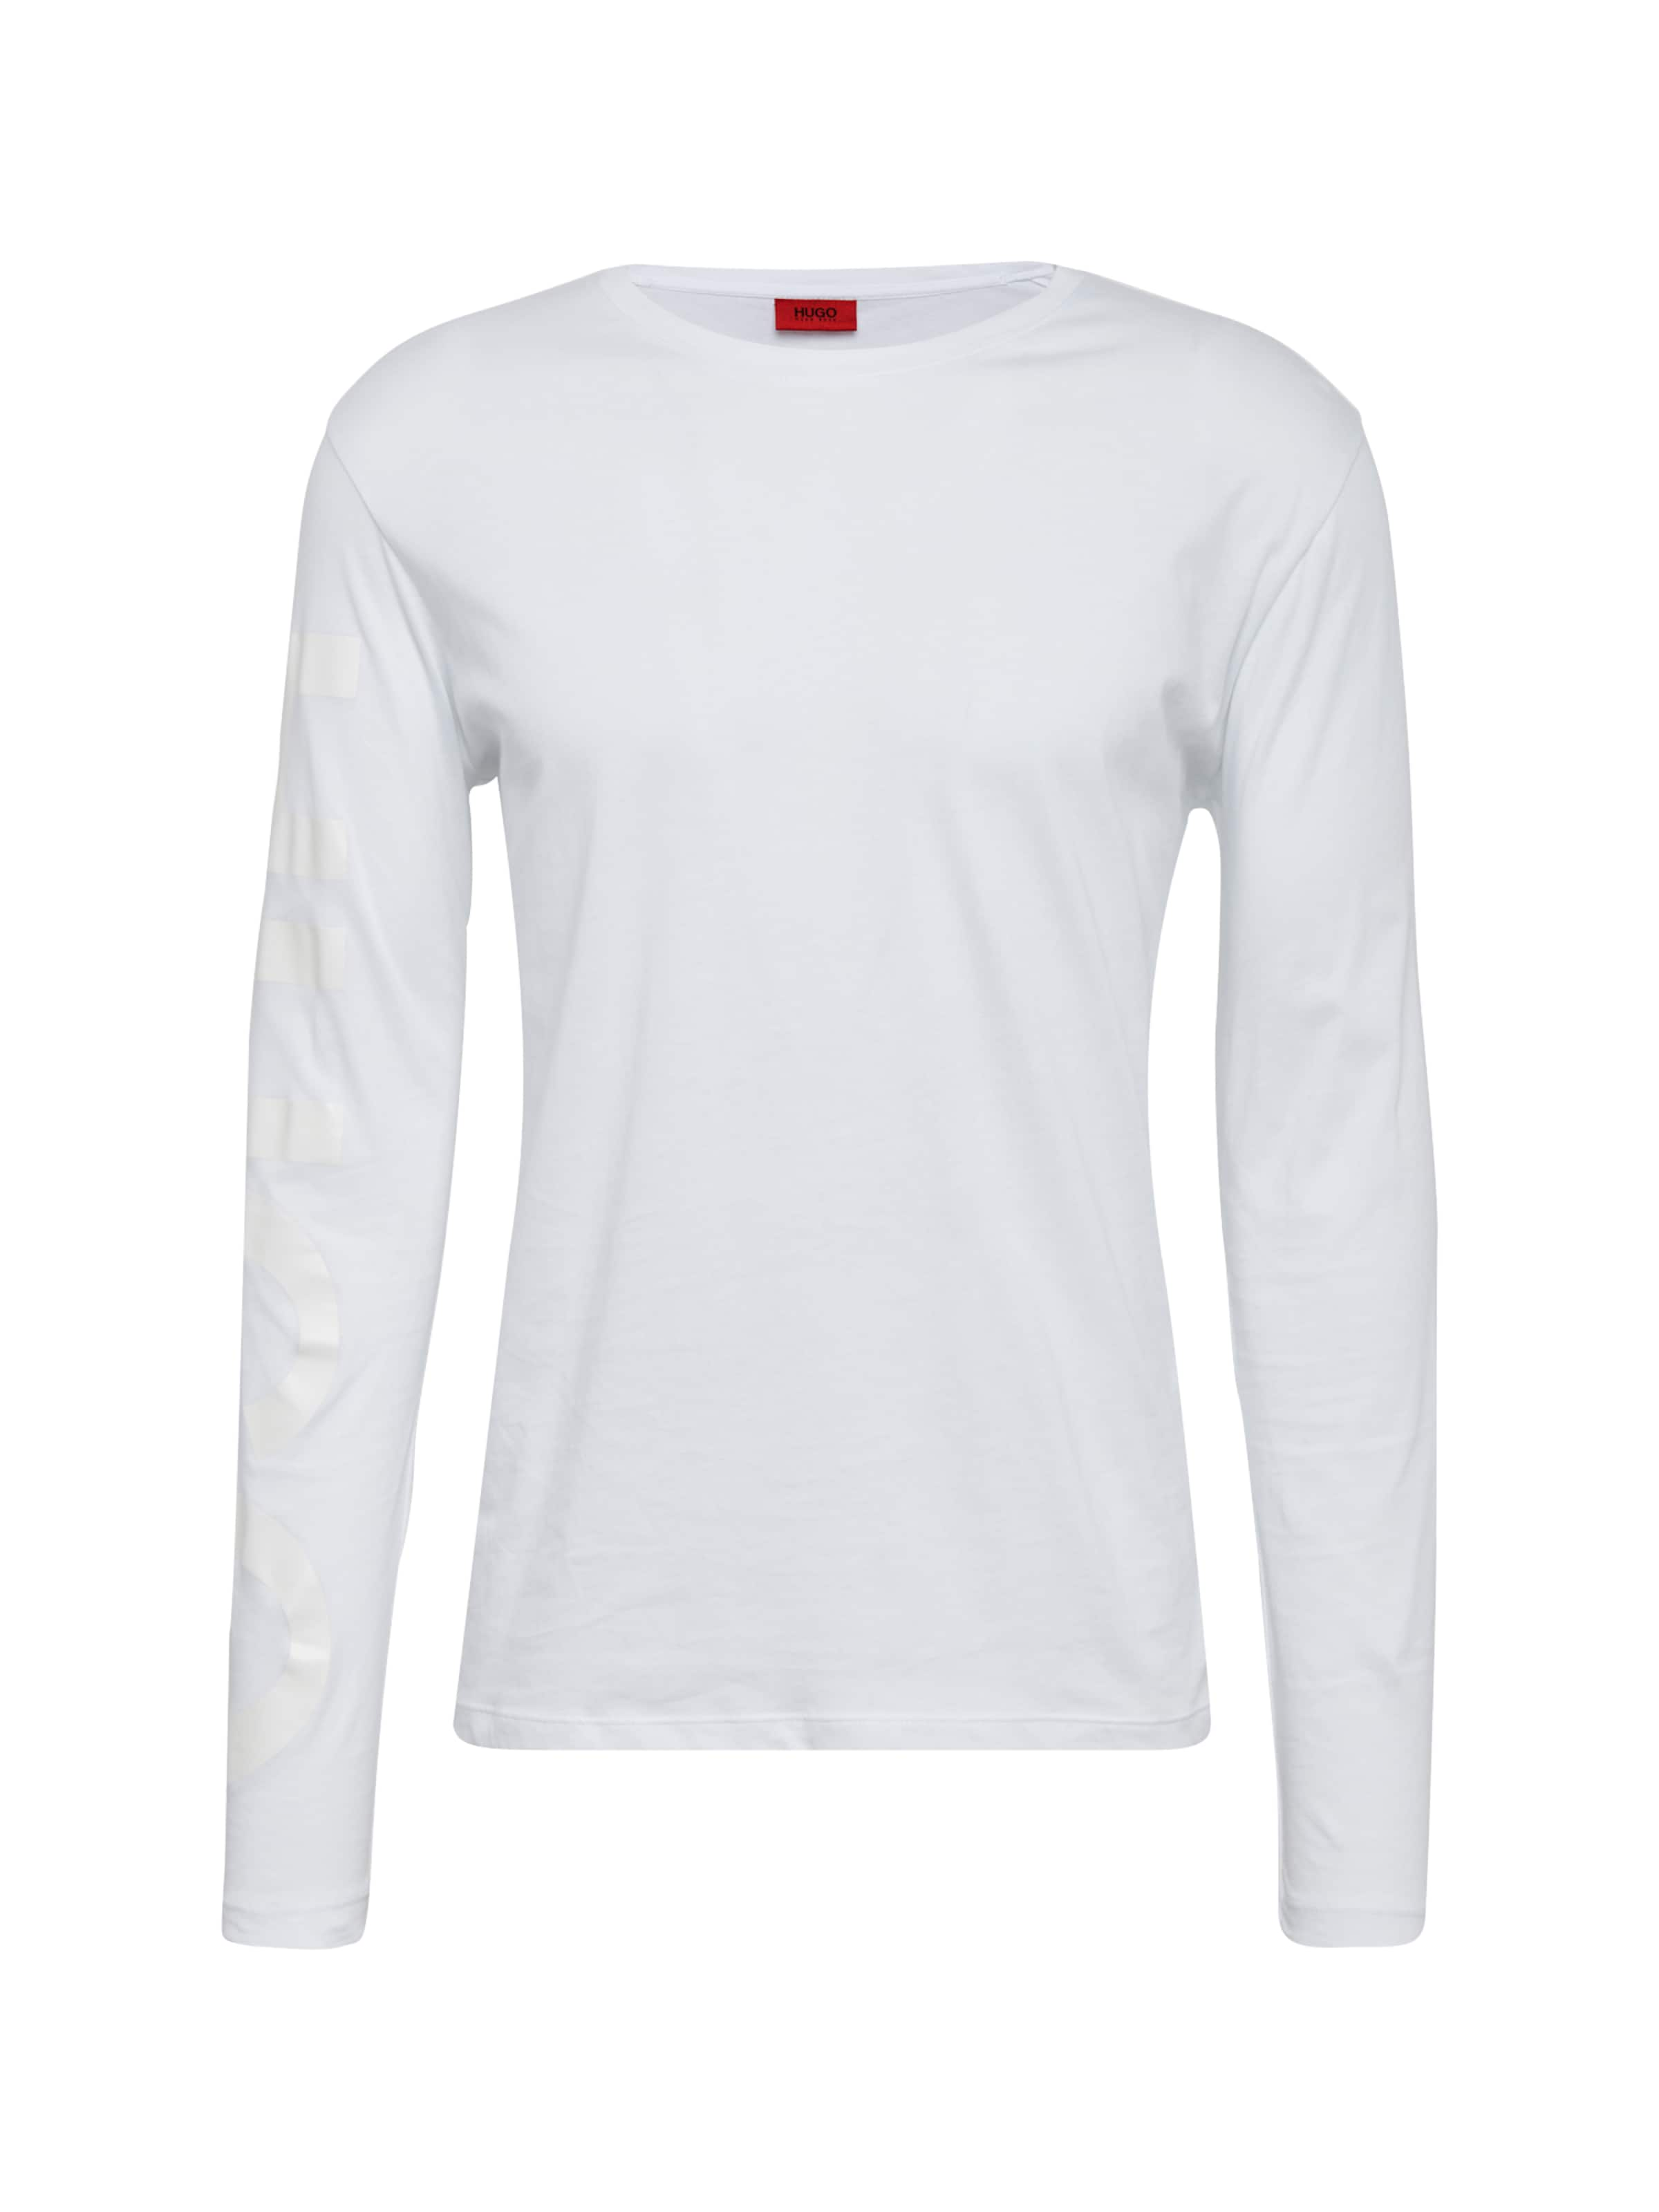 01' En Blanc 'demeos u1 T 10103774 Hugo shirt U1SqxBZ